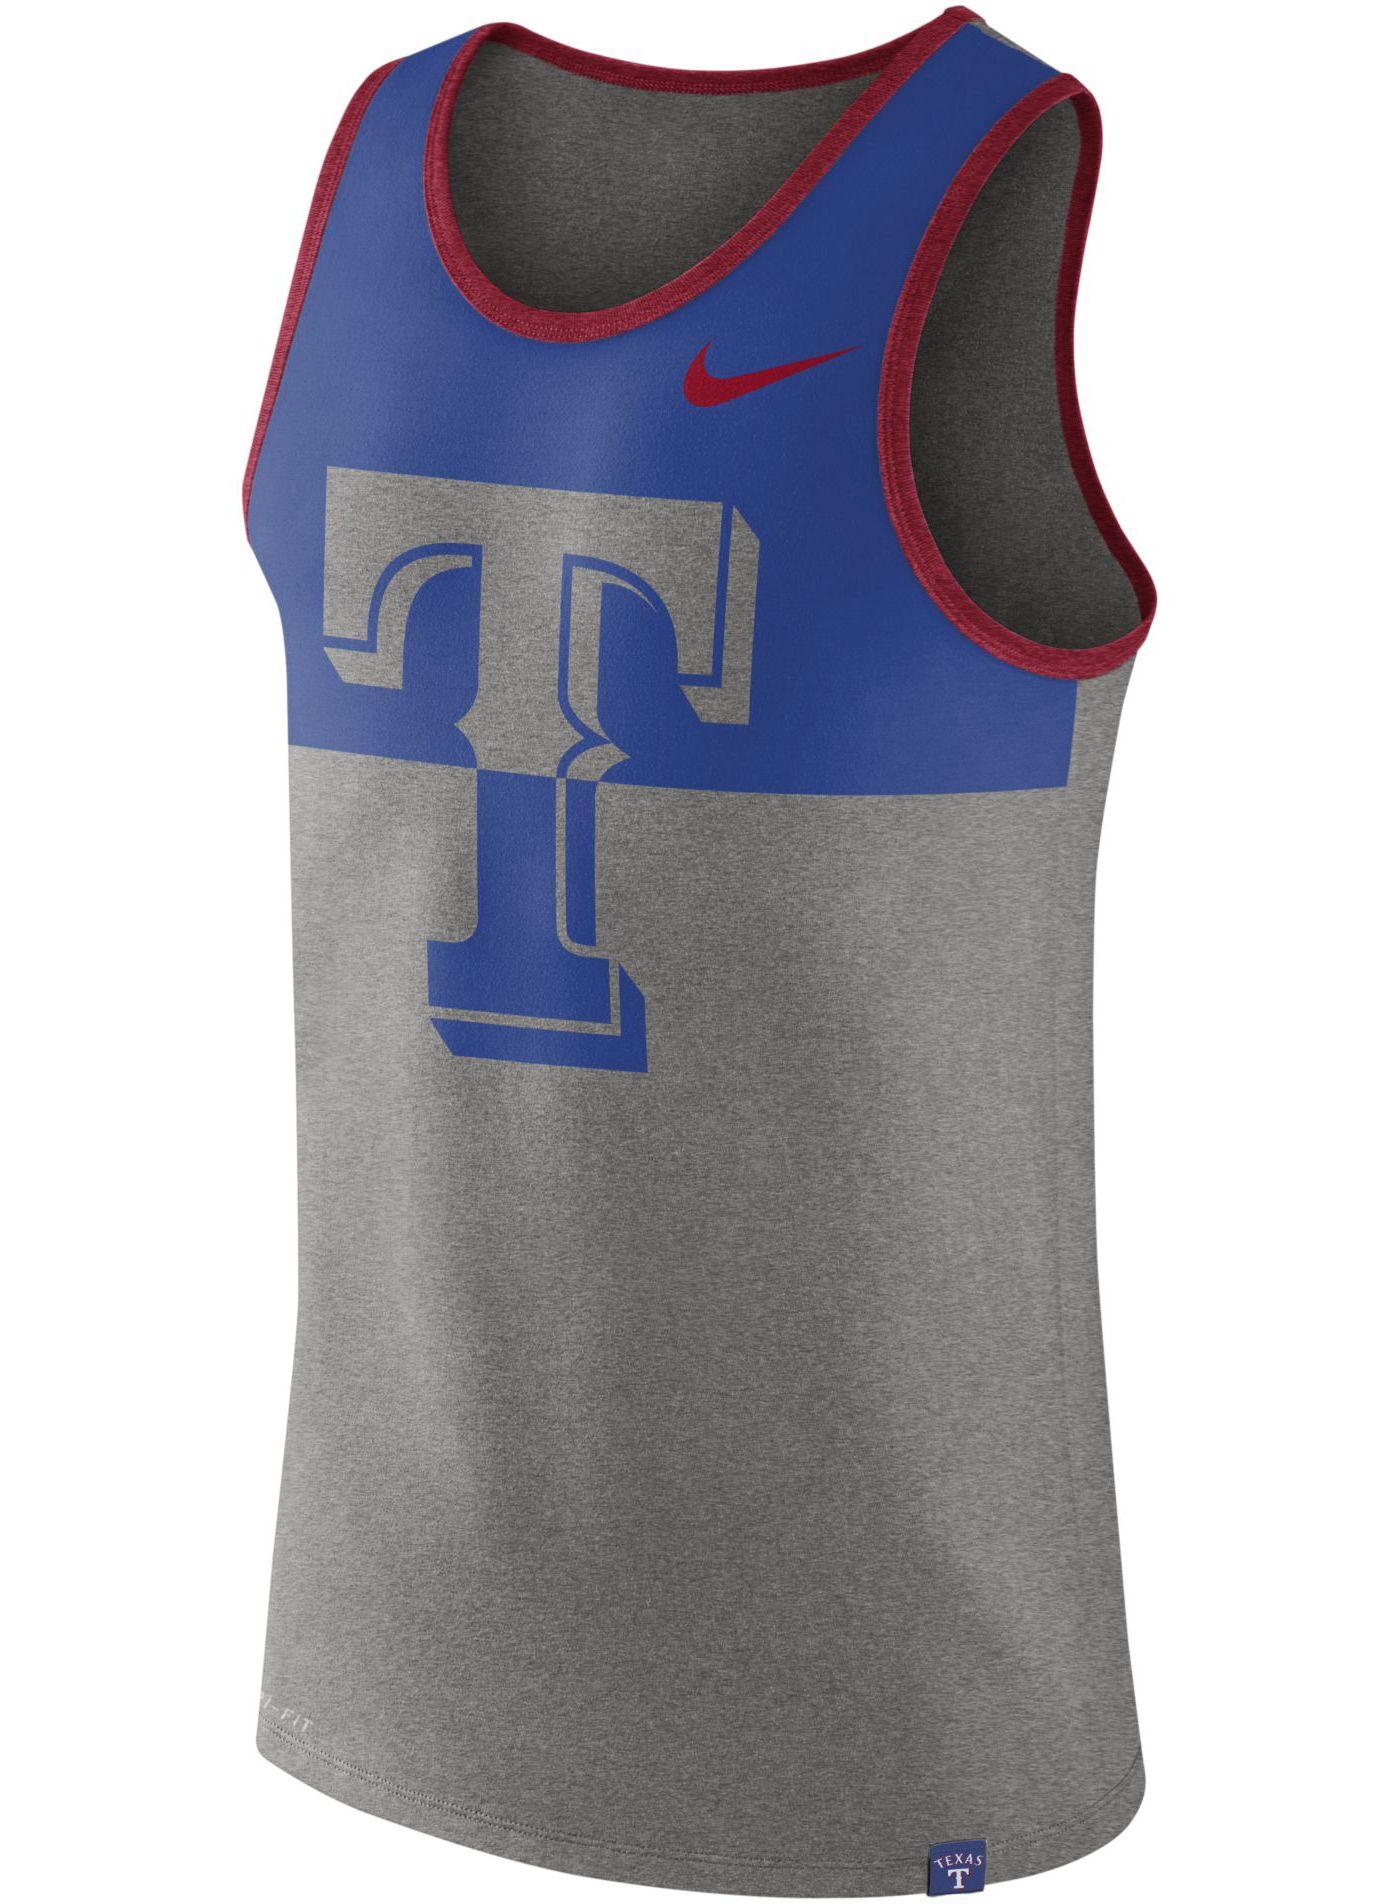 Nike Men's Texas Rangers Dri-FIT Tank Top